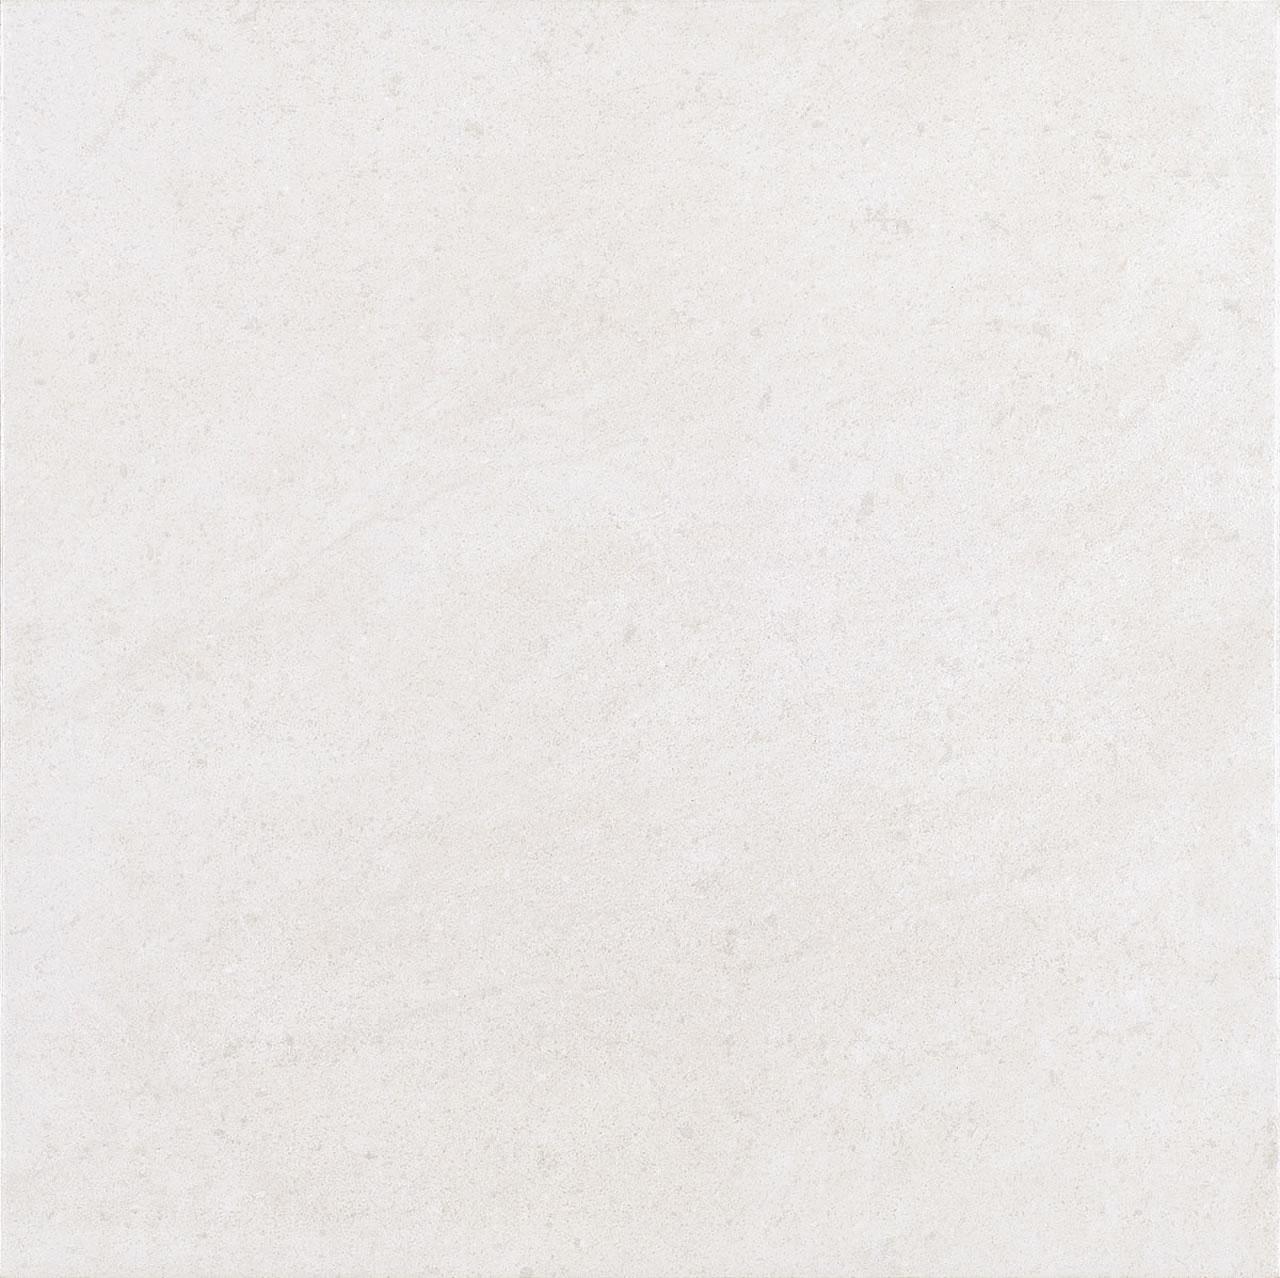 etienne branco ac 45×45